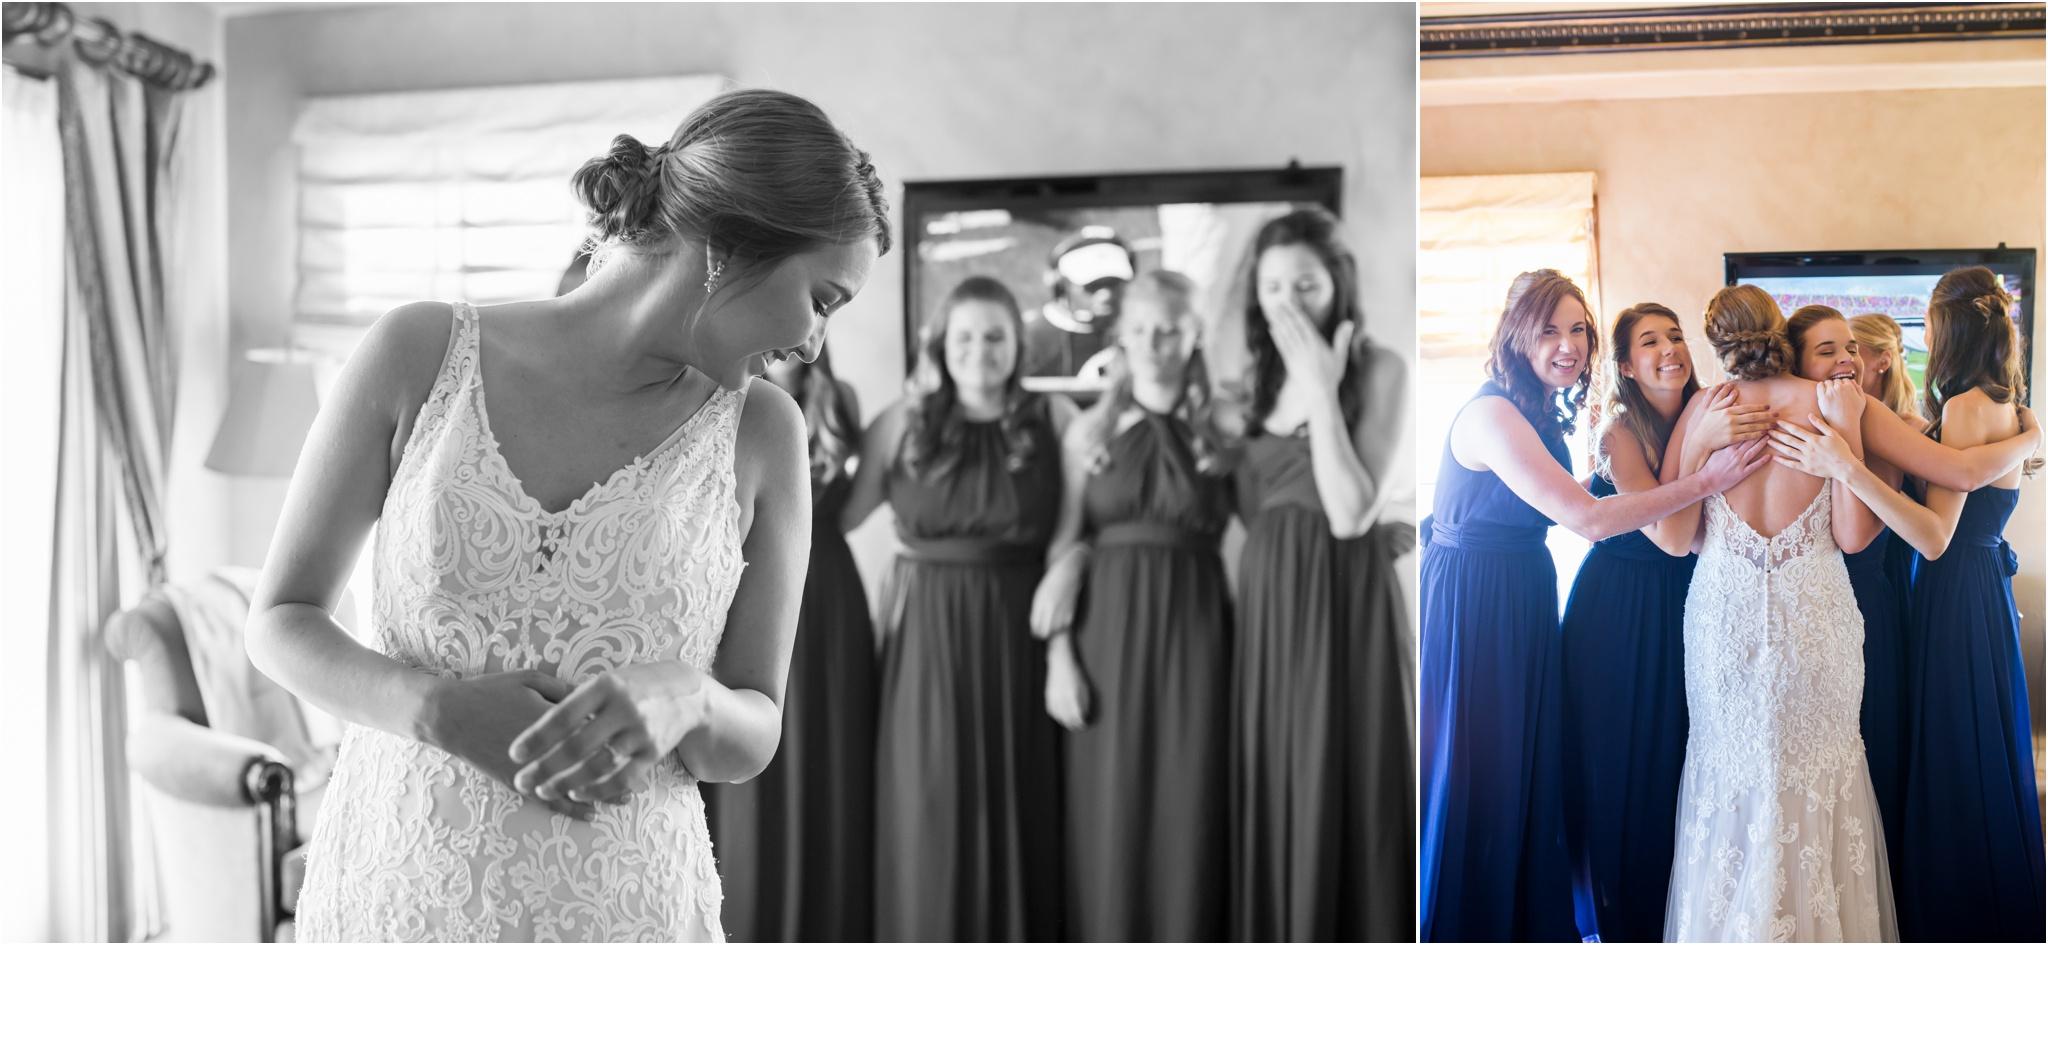 Rainey_Gregg_Photography_St._Simons_Island_Georgia_California_Wedding_Portrait_Photography_0638.jpg